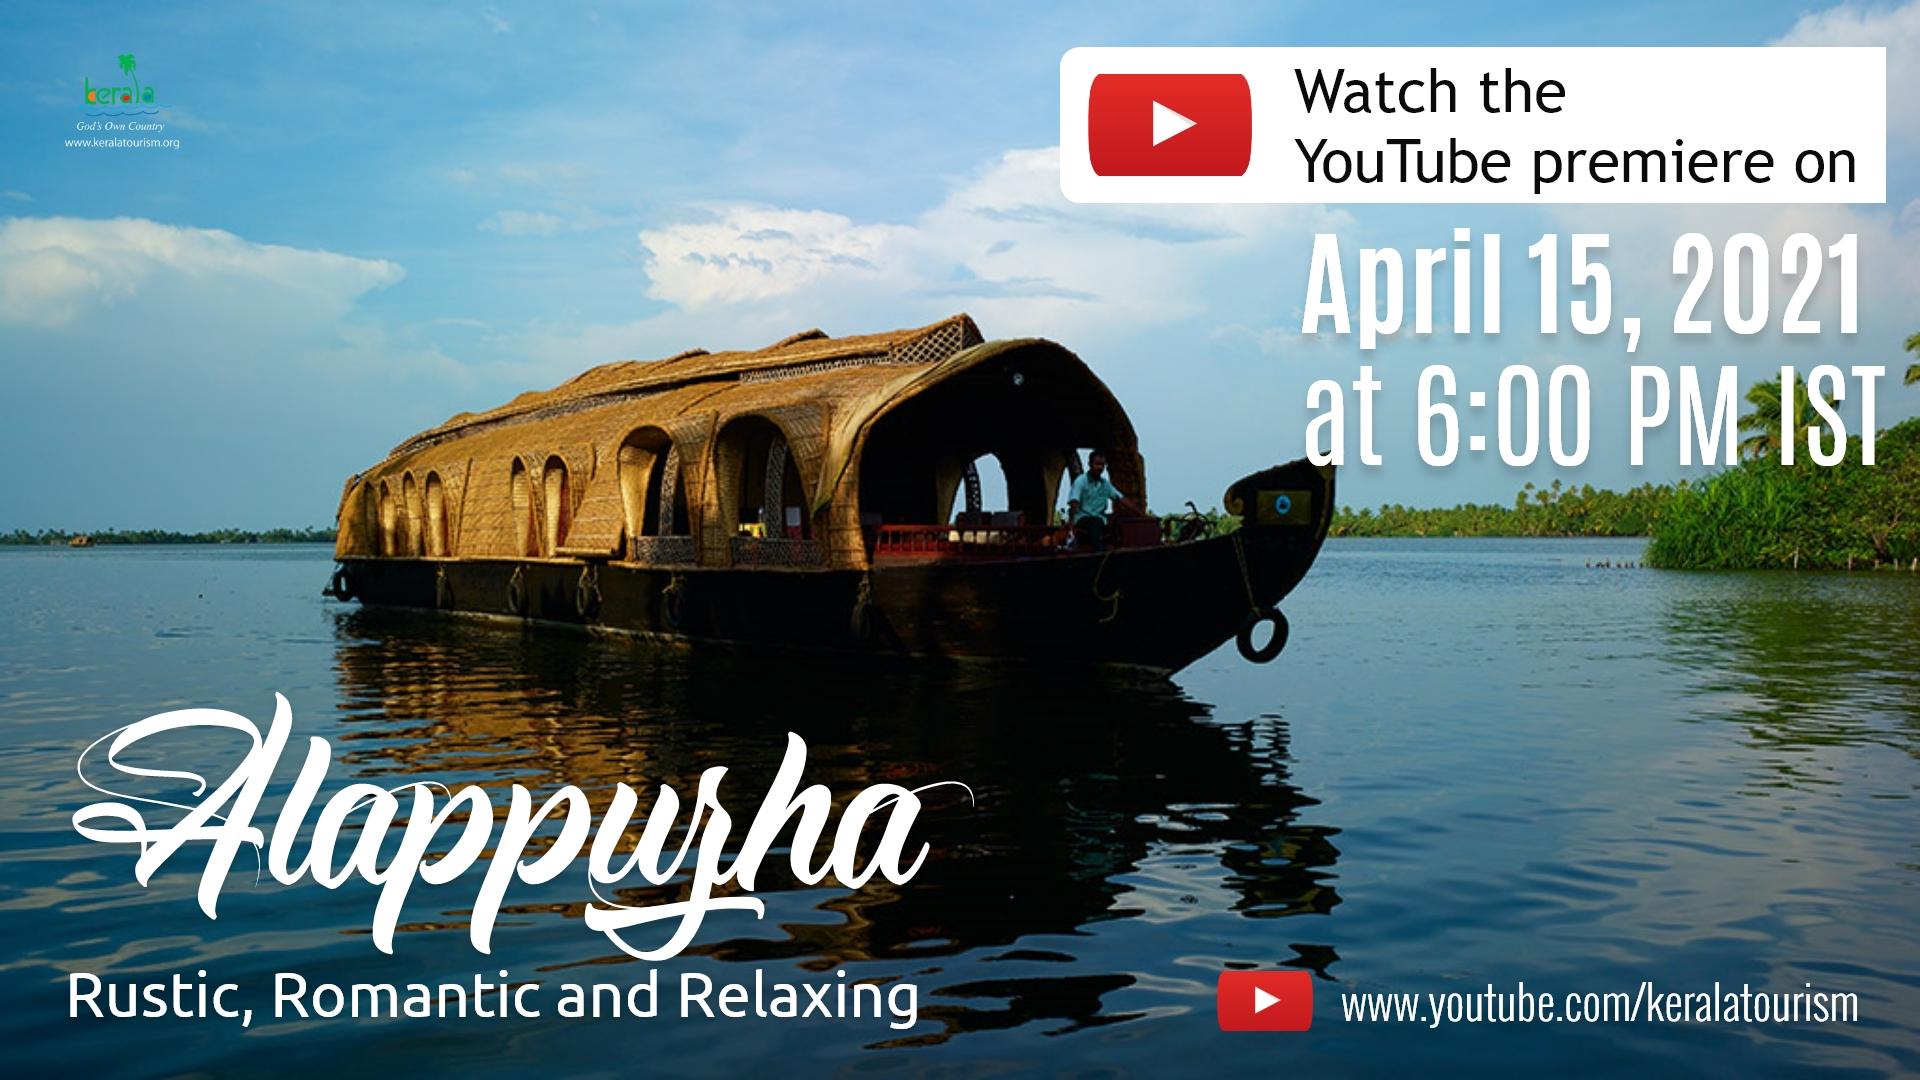 Alappuzha - Traveller's choice